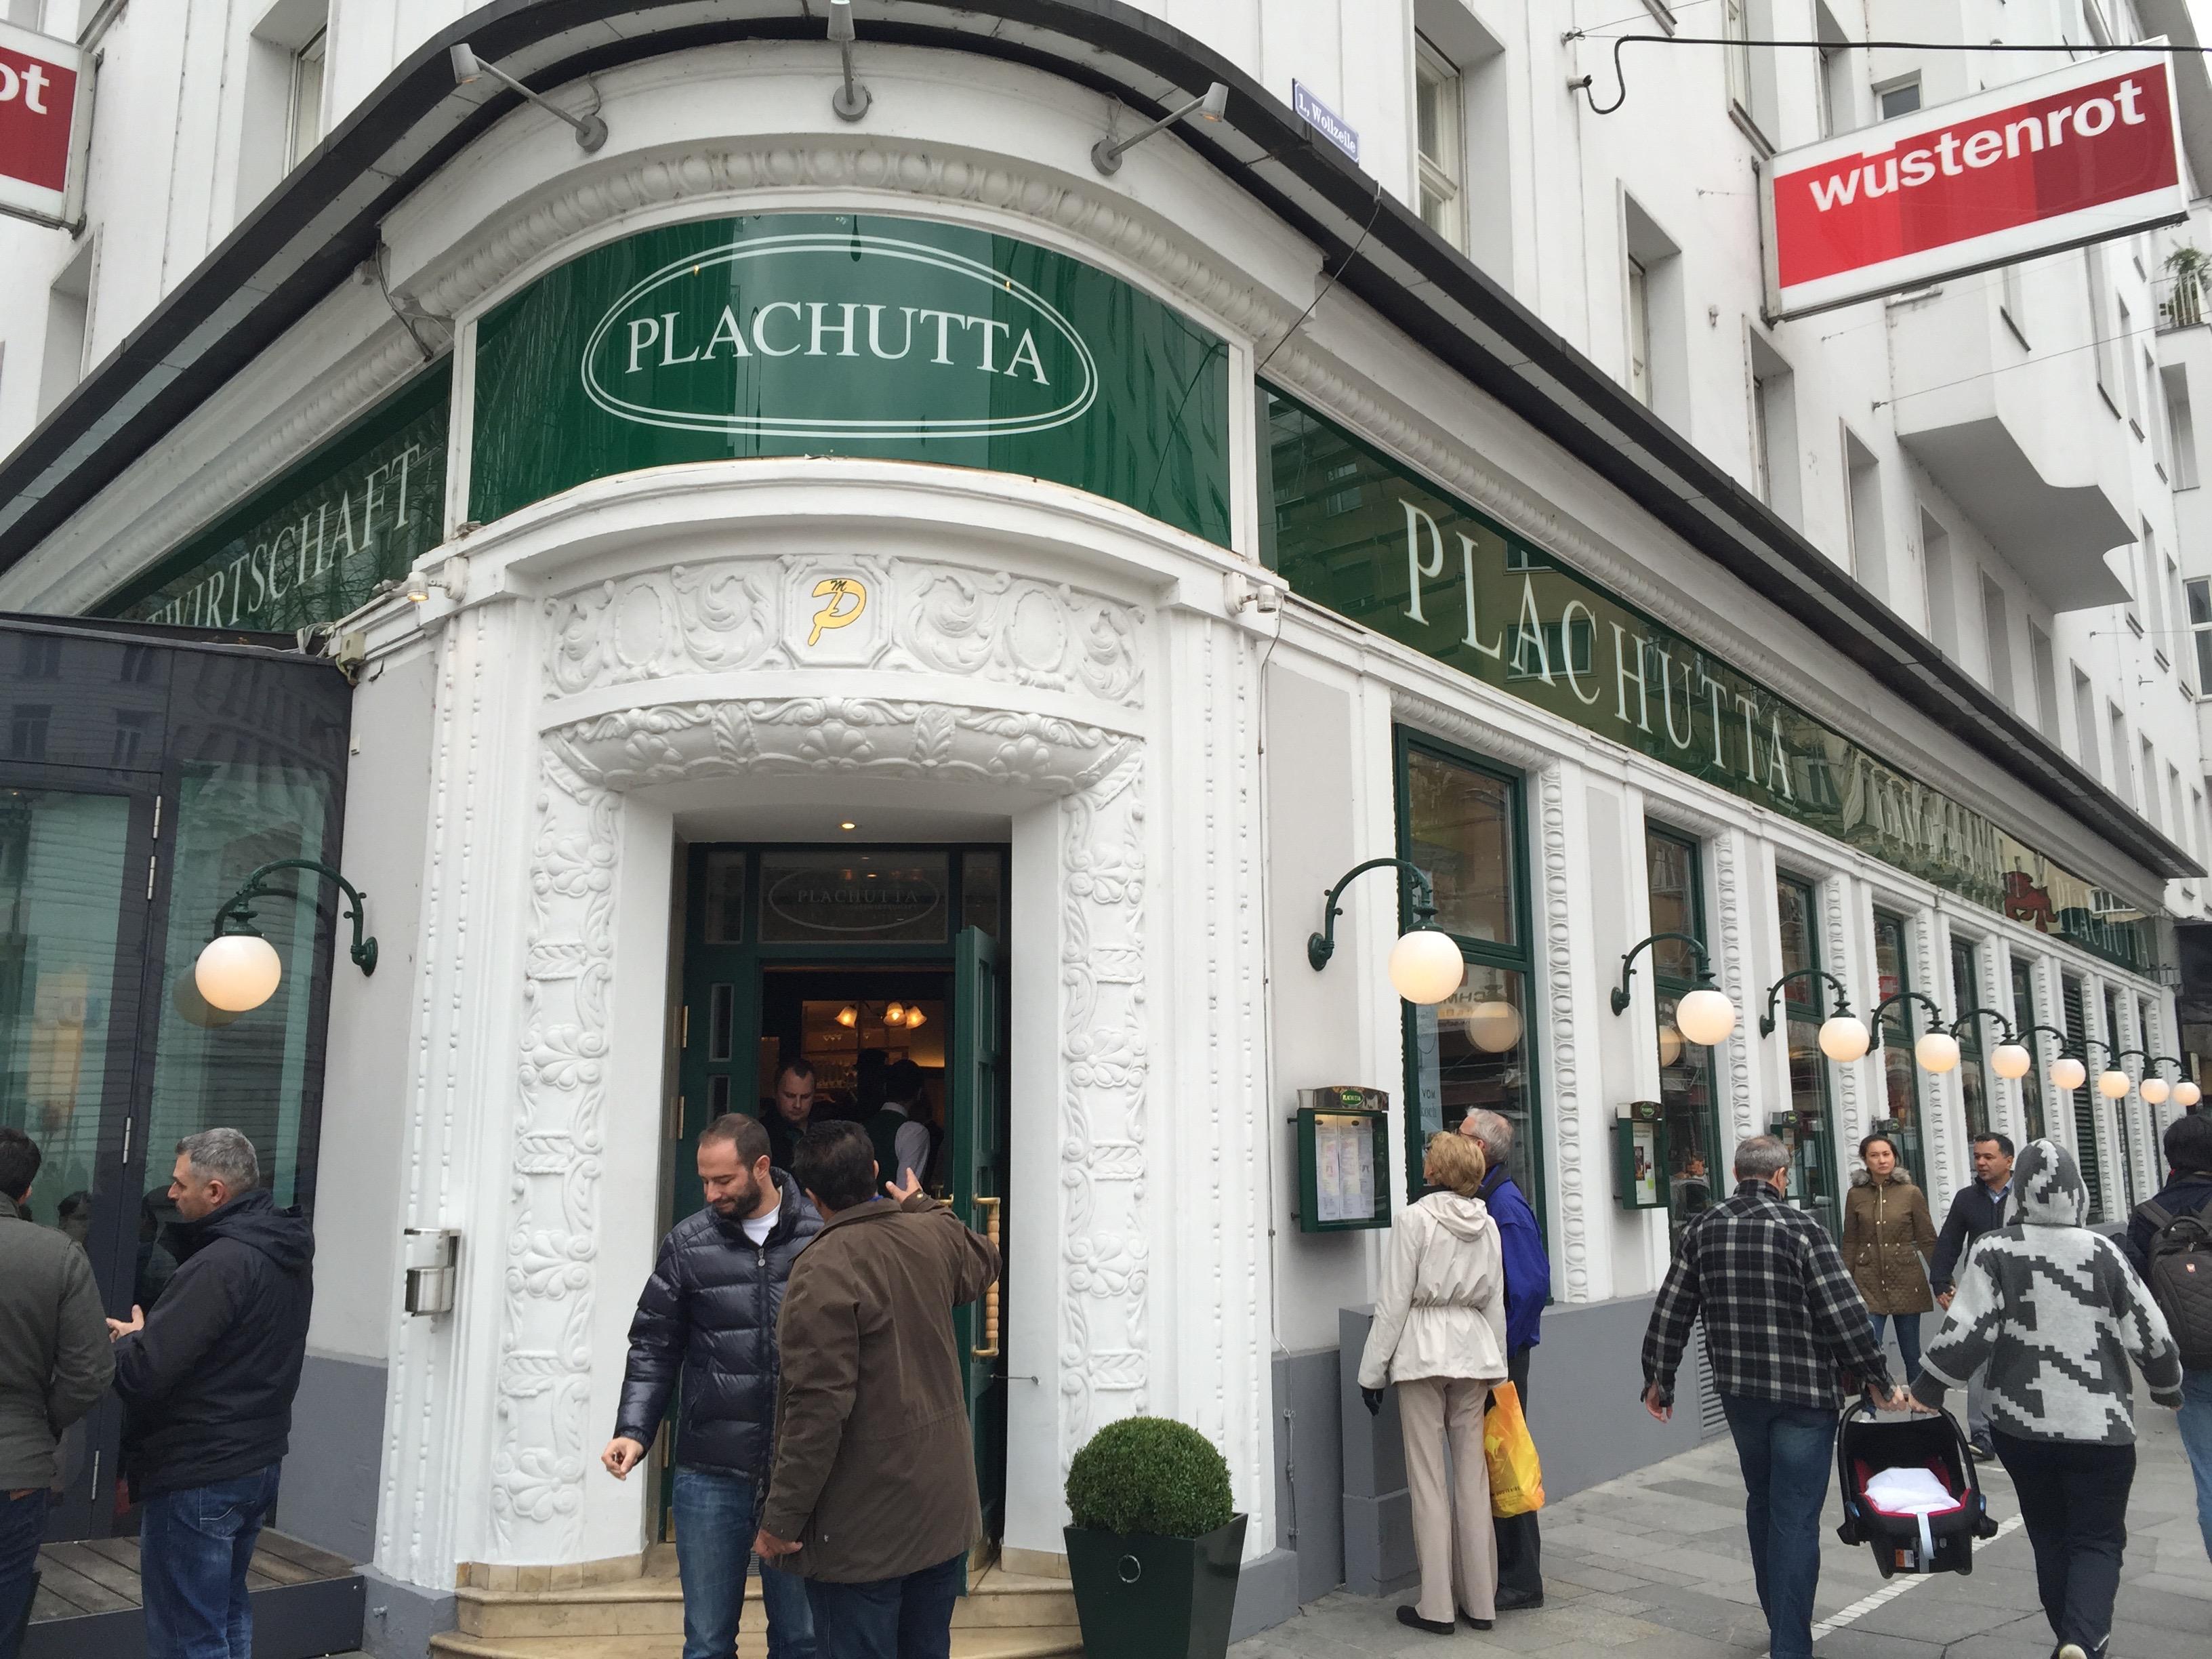 Plachutta Vienna 10 25 14 Dining With Frankie